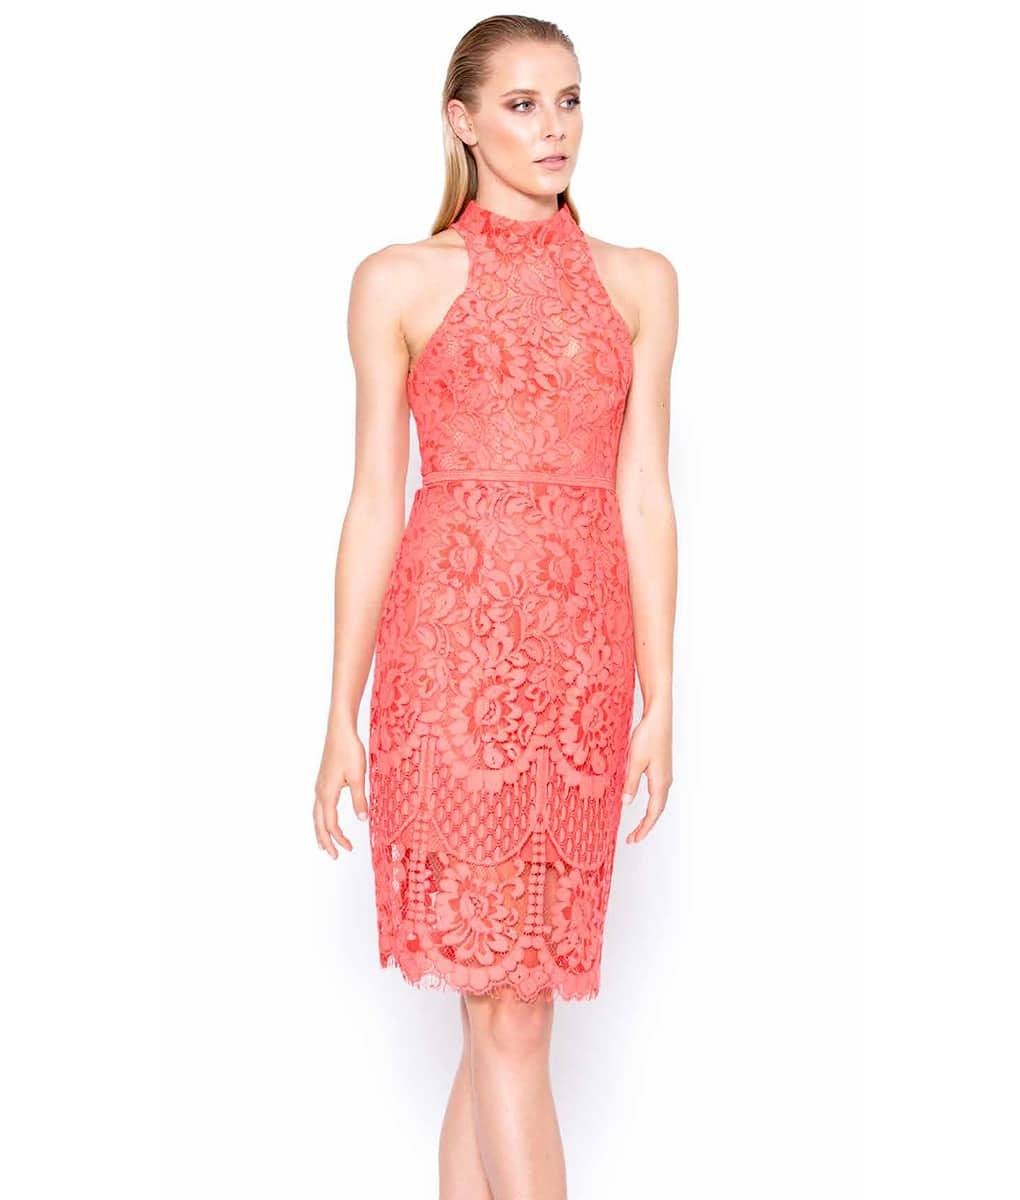 793fca96df6 Alila Boutique Coral Halter Neck Lace Dress